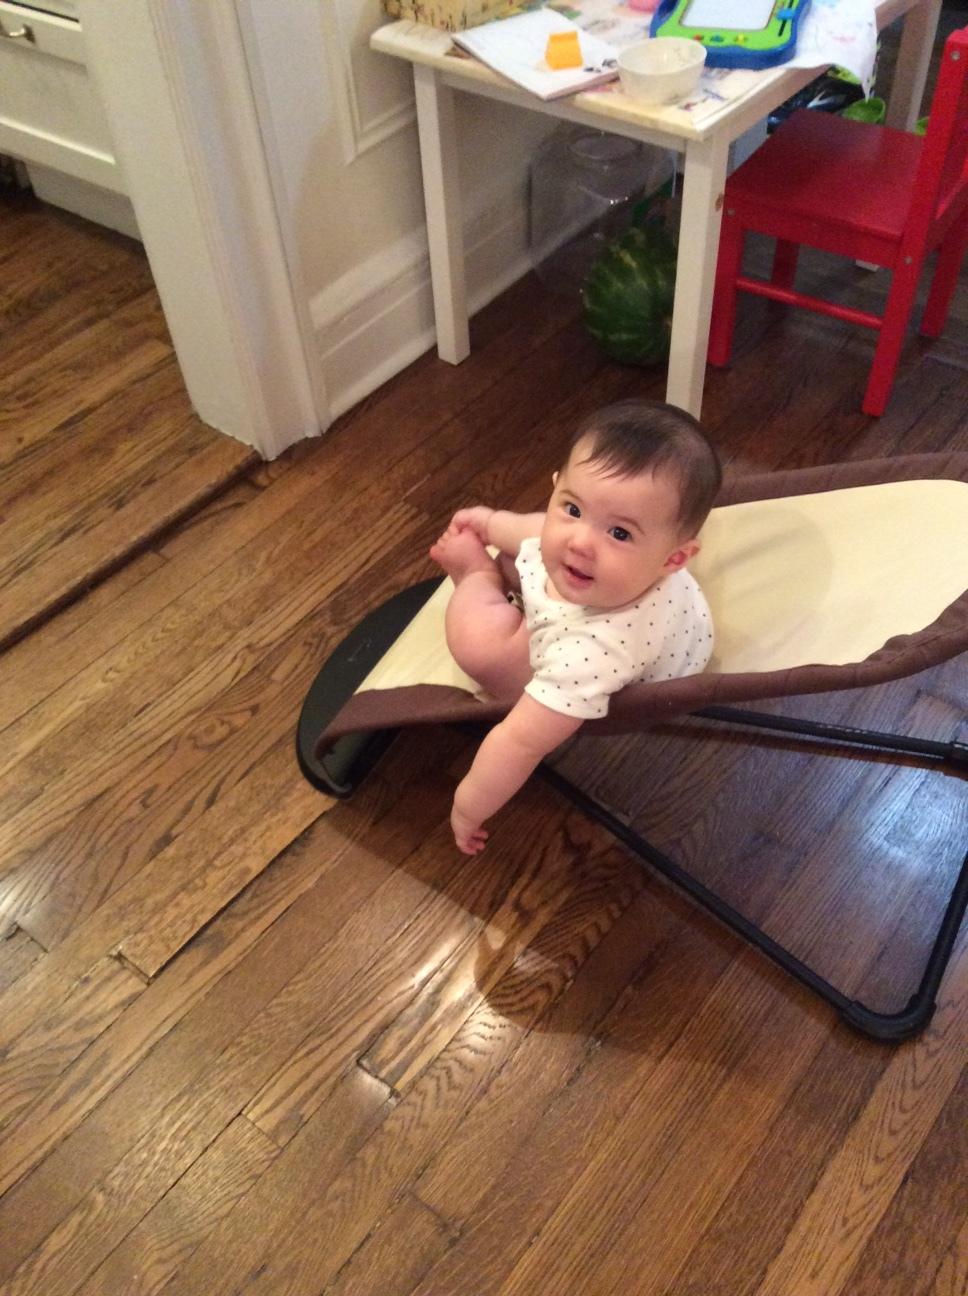 former Formosa cellist Ru-Pei's baby, Ella